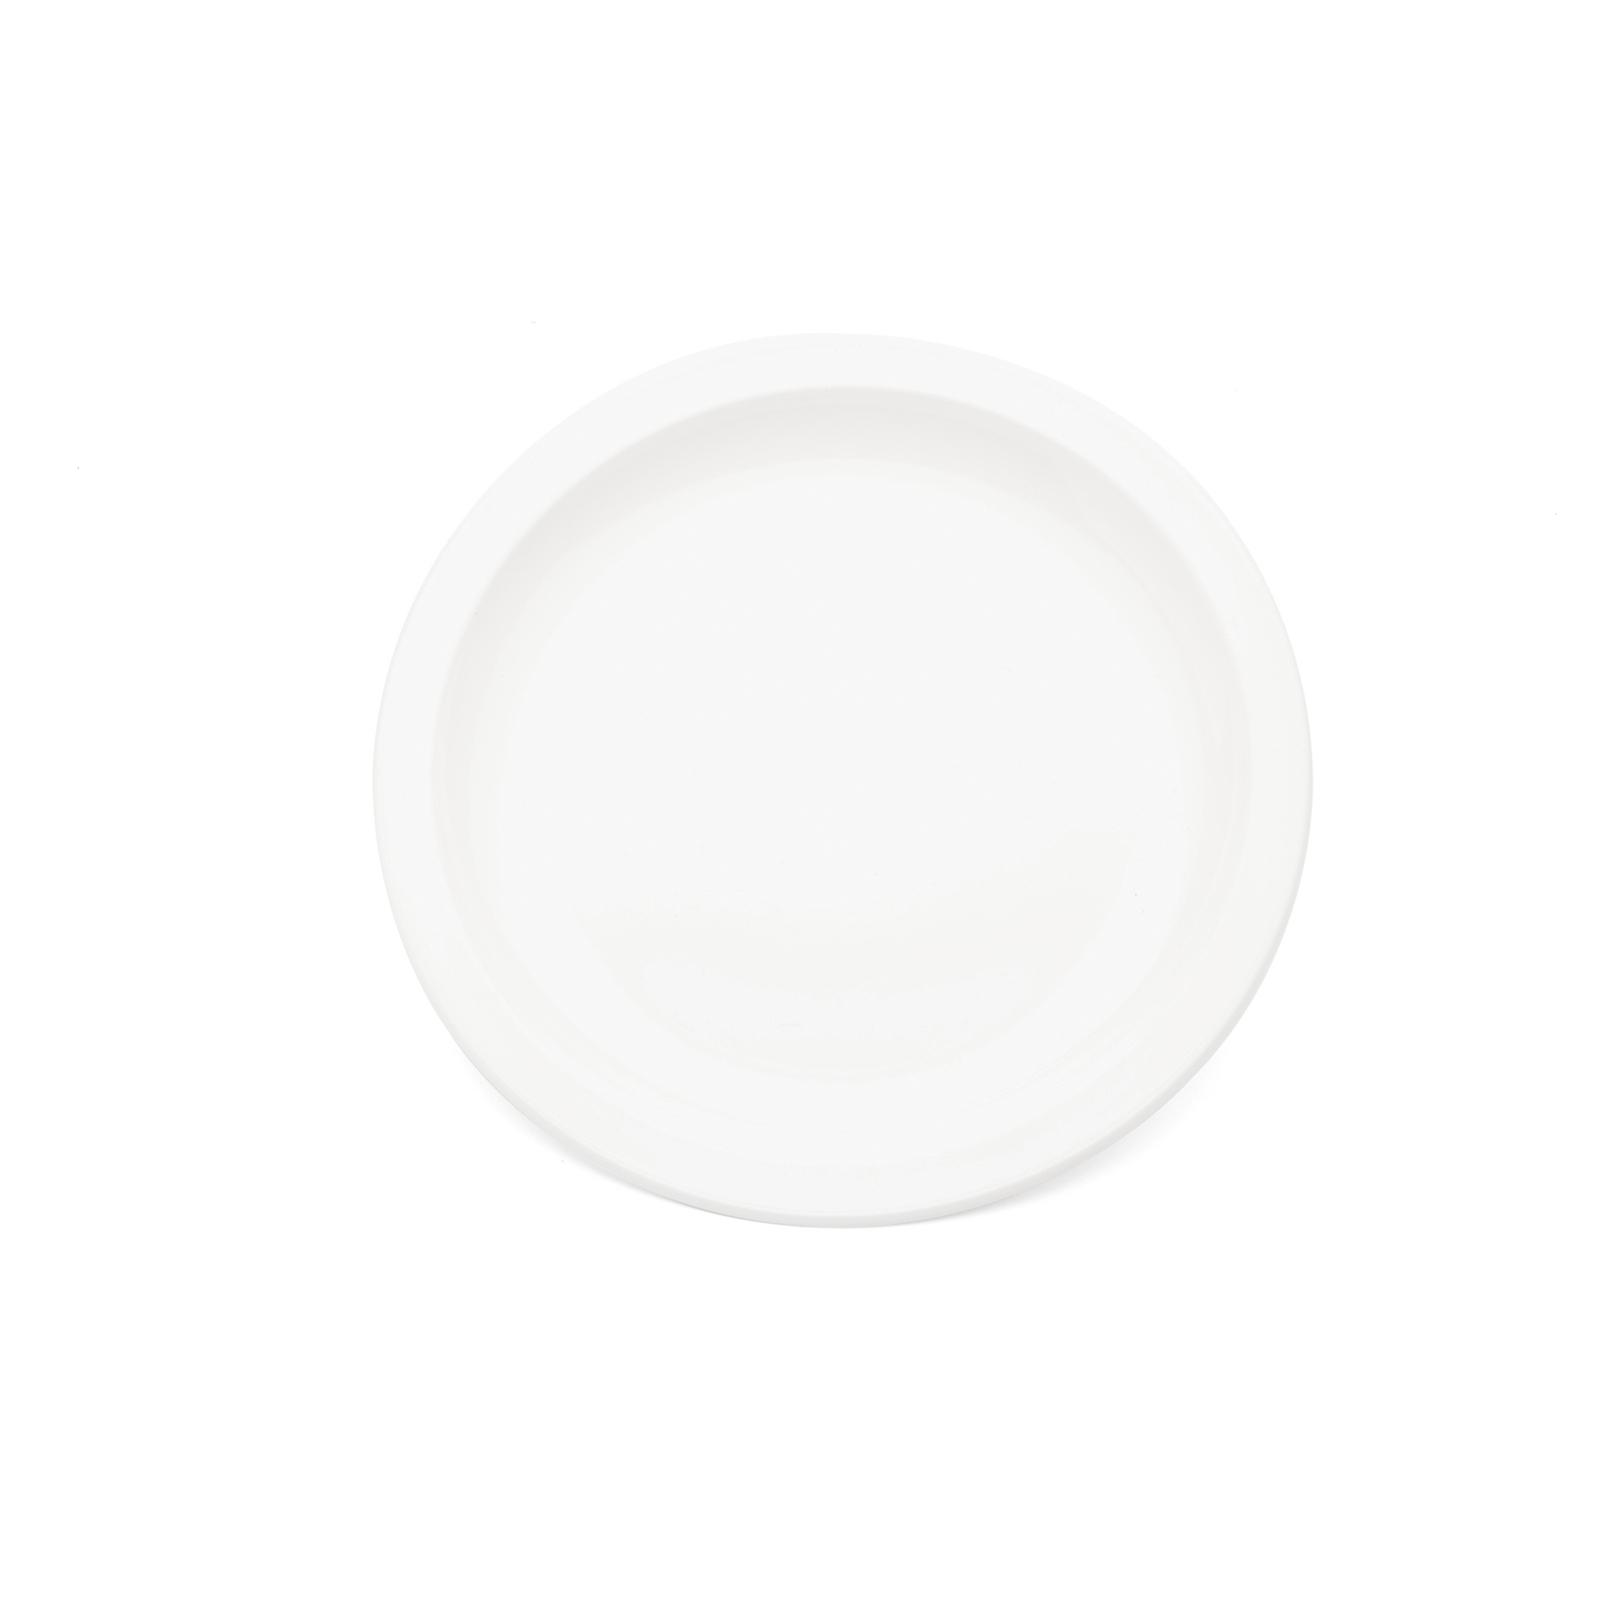 Polycarb Plate 225mm - White